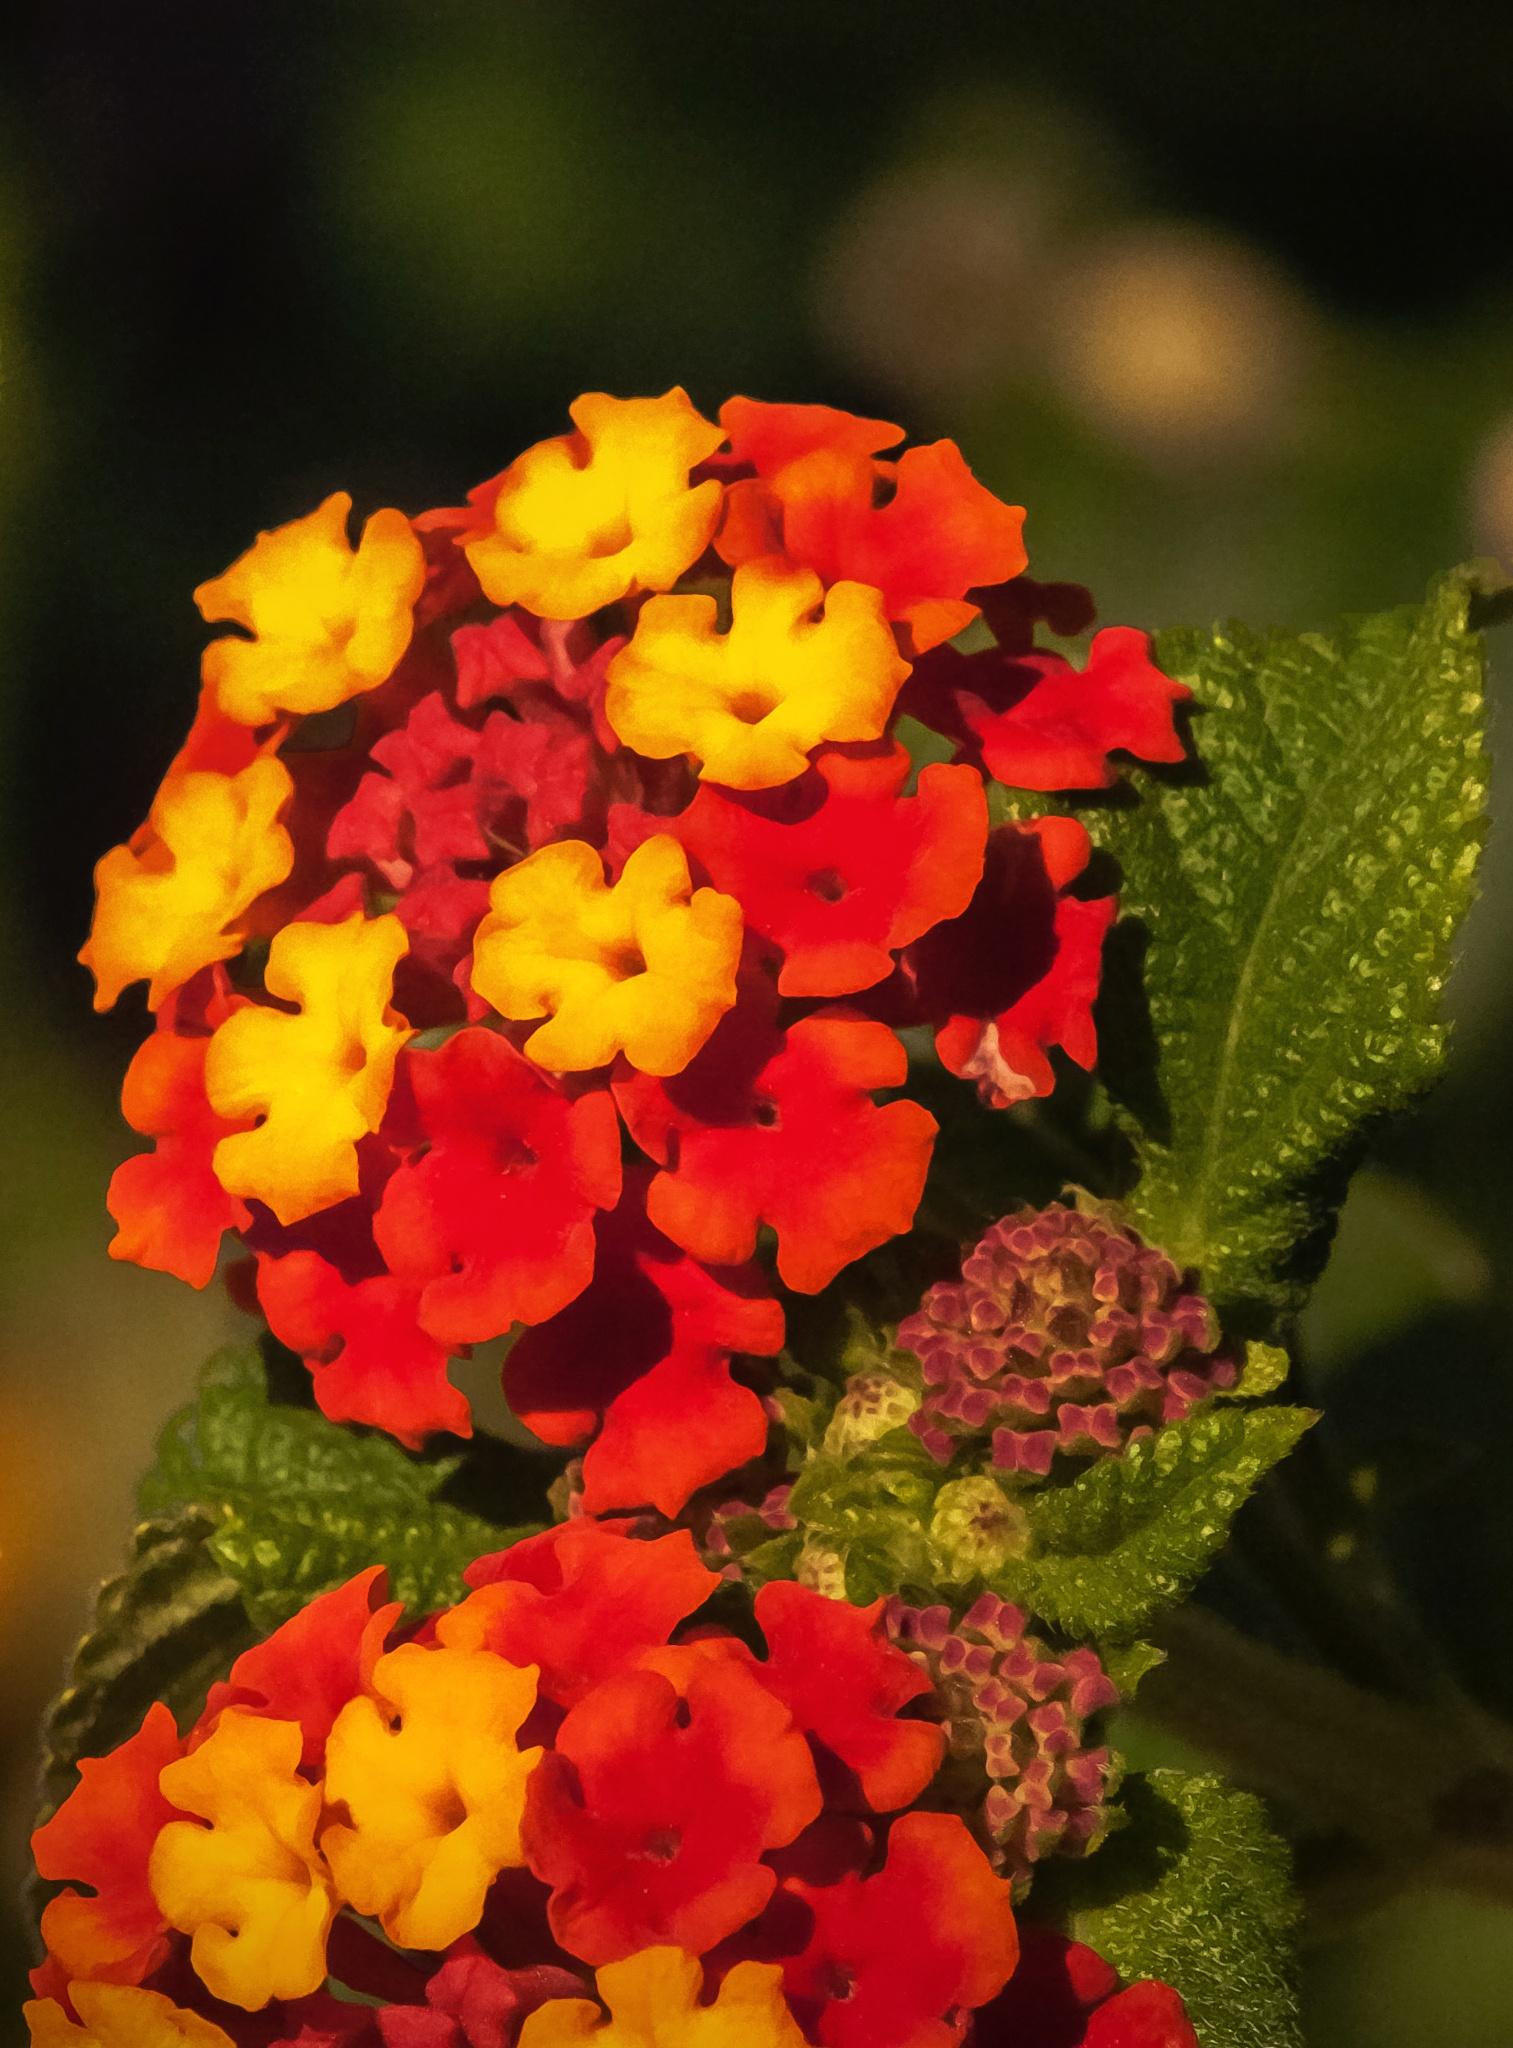 Yellow Flowers by donato rondini